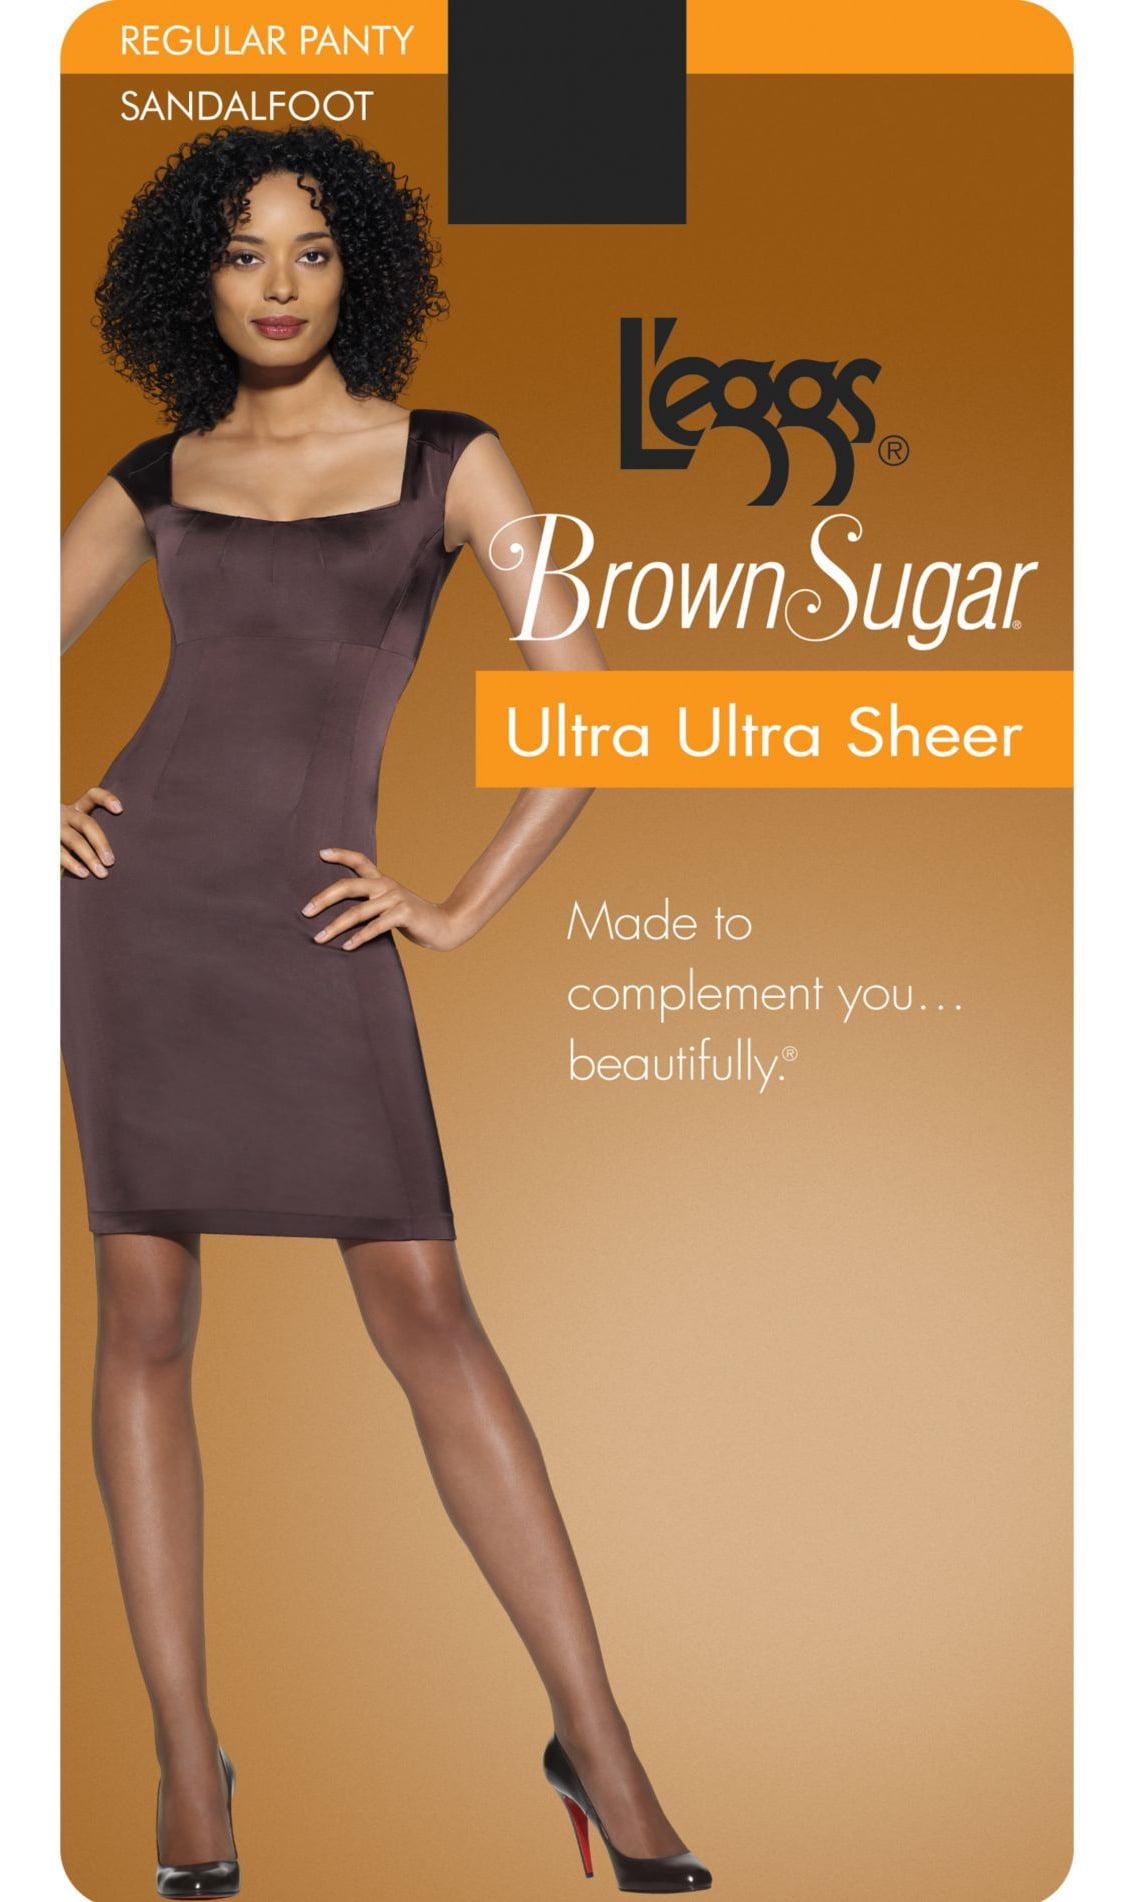 63fc0335da4 L eggs - Brown Sugar Ultra Ultra Sheer Hosiery - Walmart.com